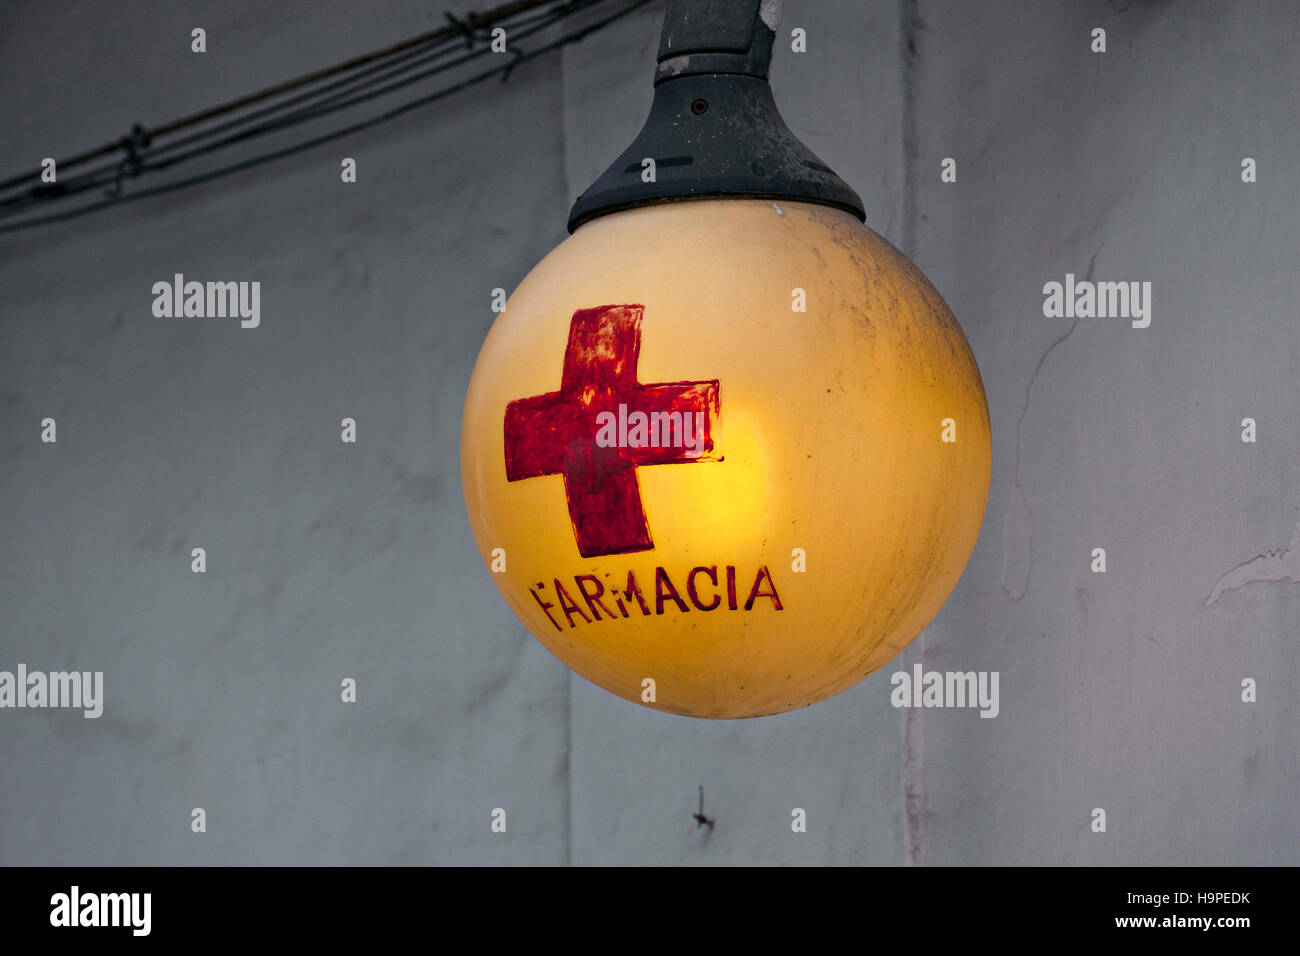 Italian Chemist Shop light sign, Capri, Campania, Italy, Europe - Stock Image